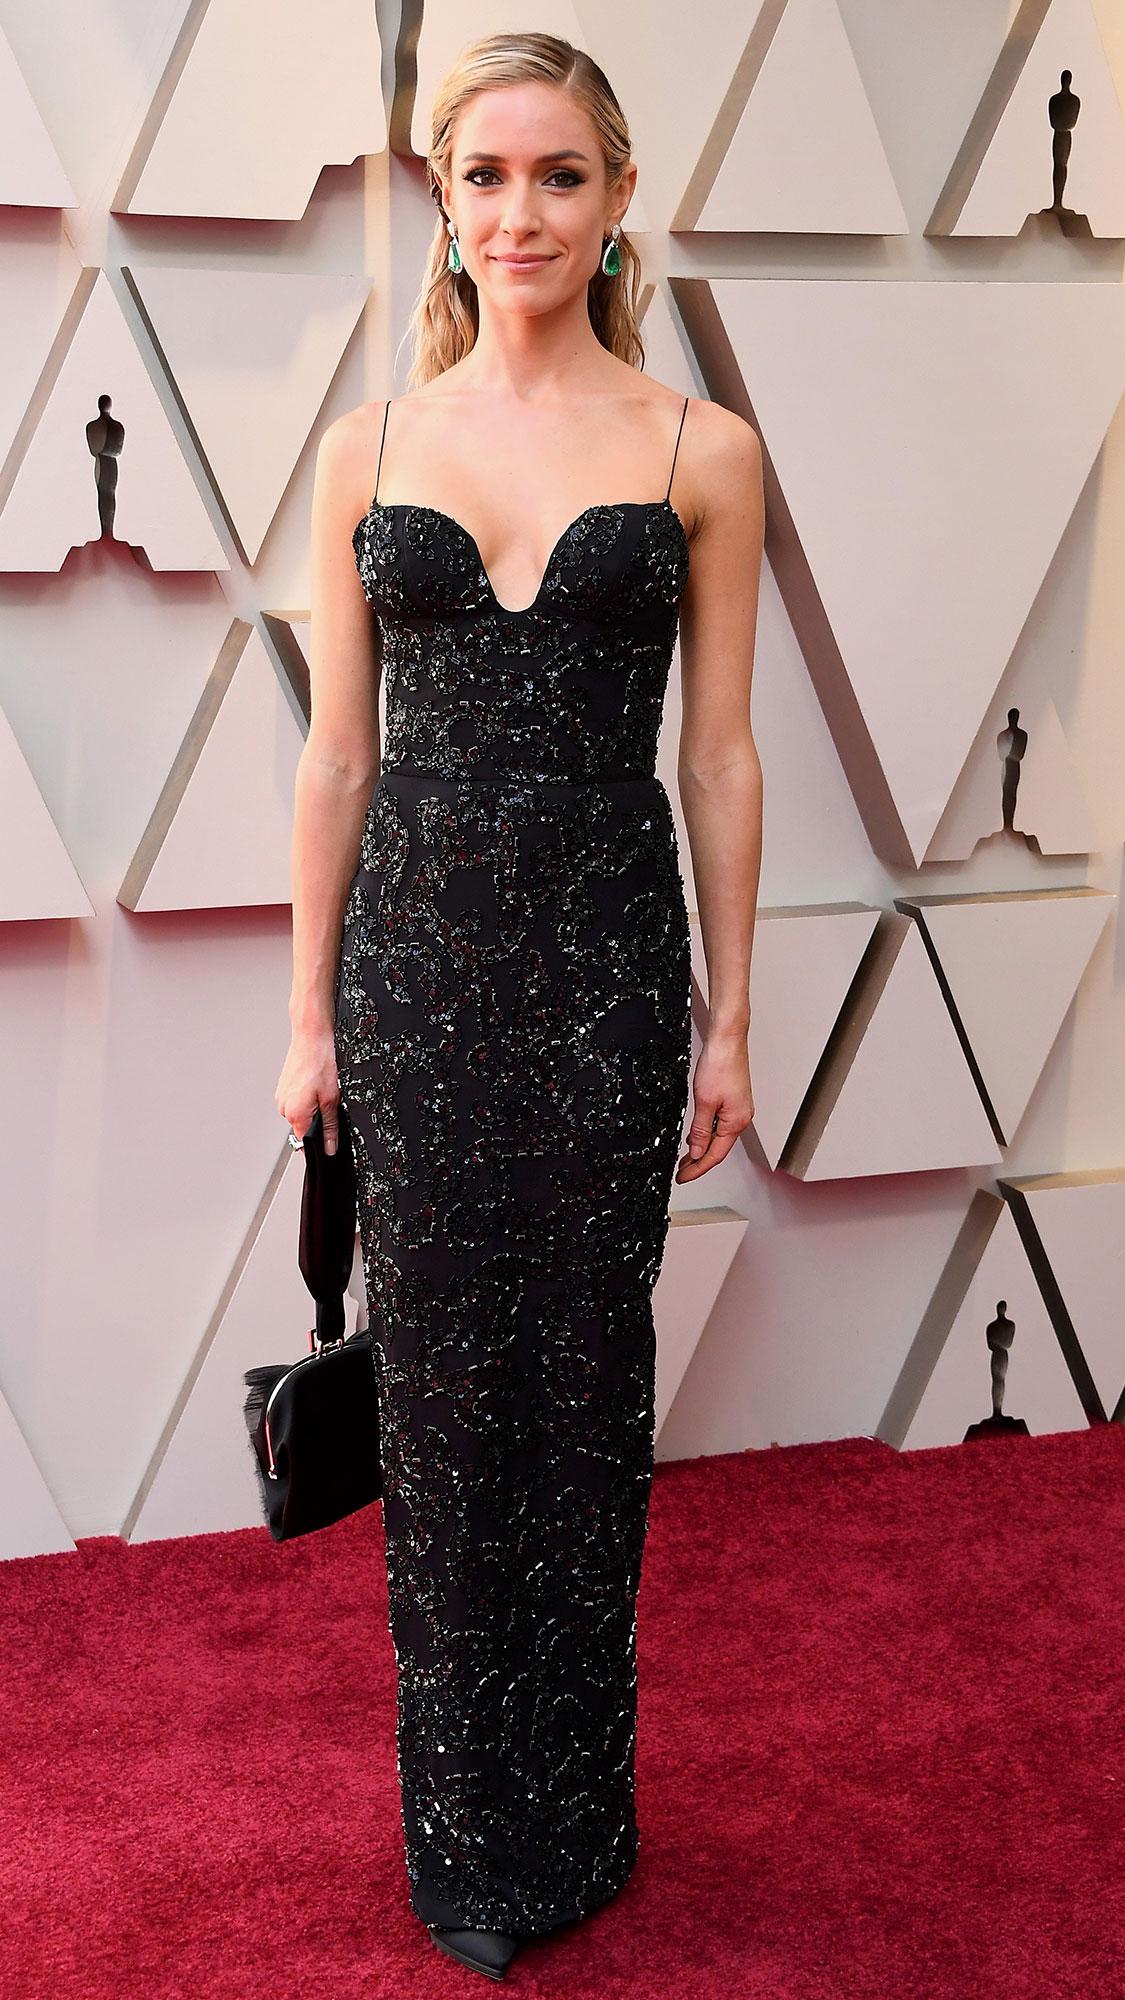 ccf8e1cc72 Oscars 2019 Red Carpet Fashion: See Celeb Dresses, Gowns